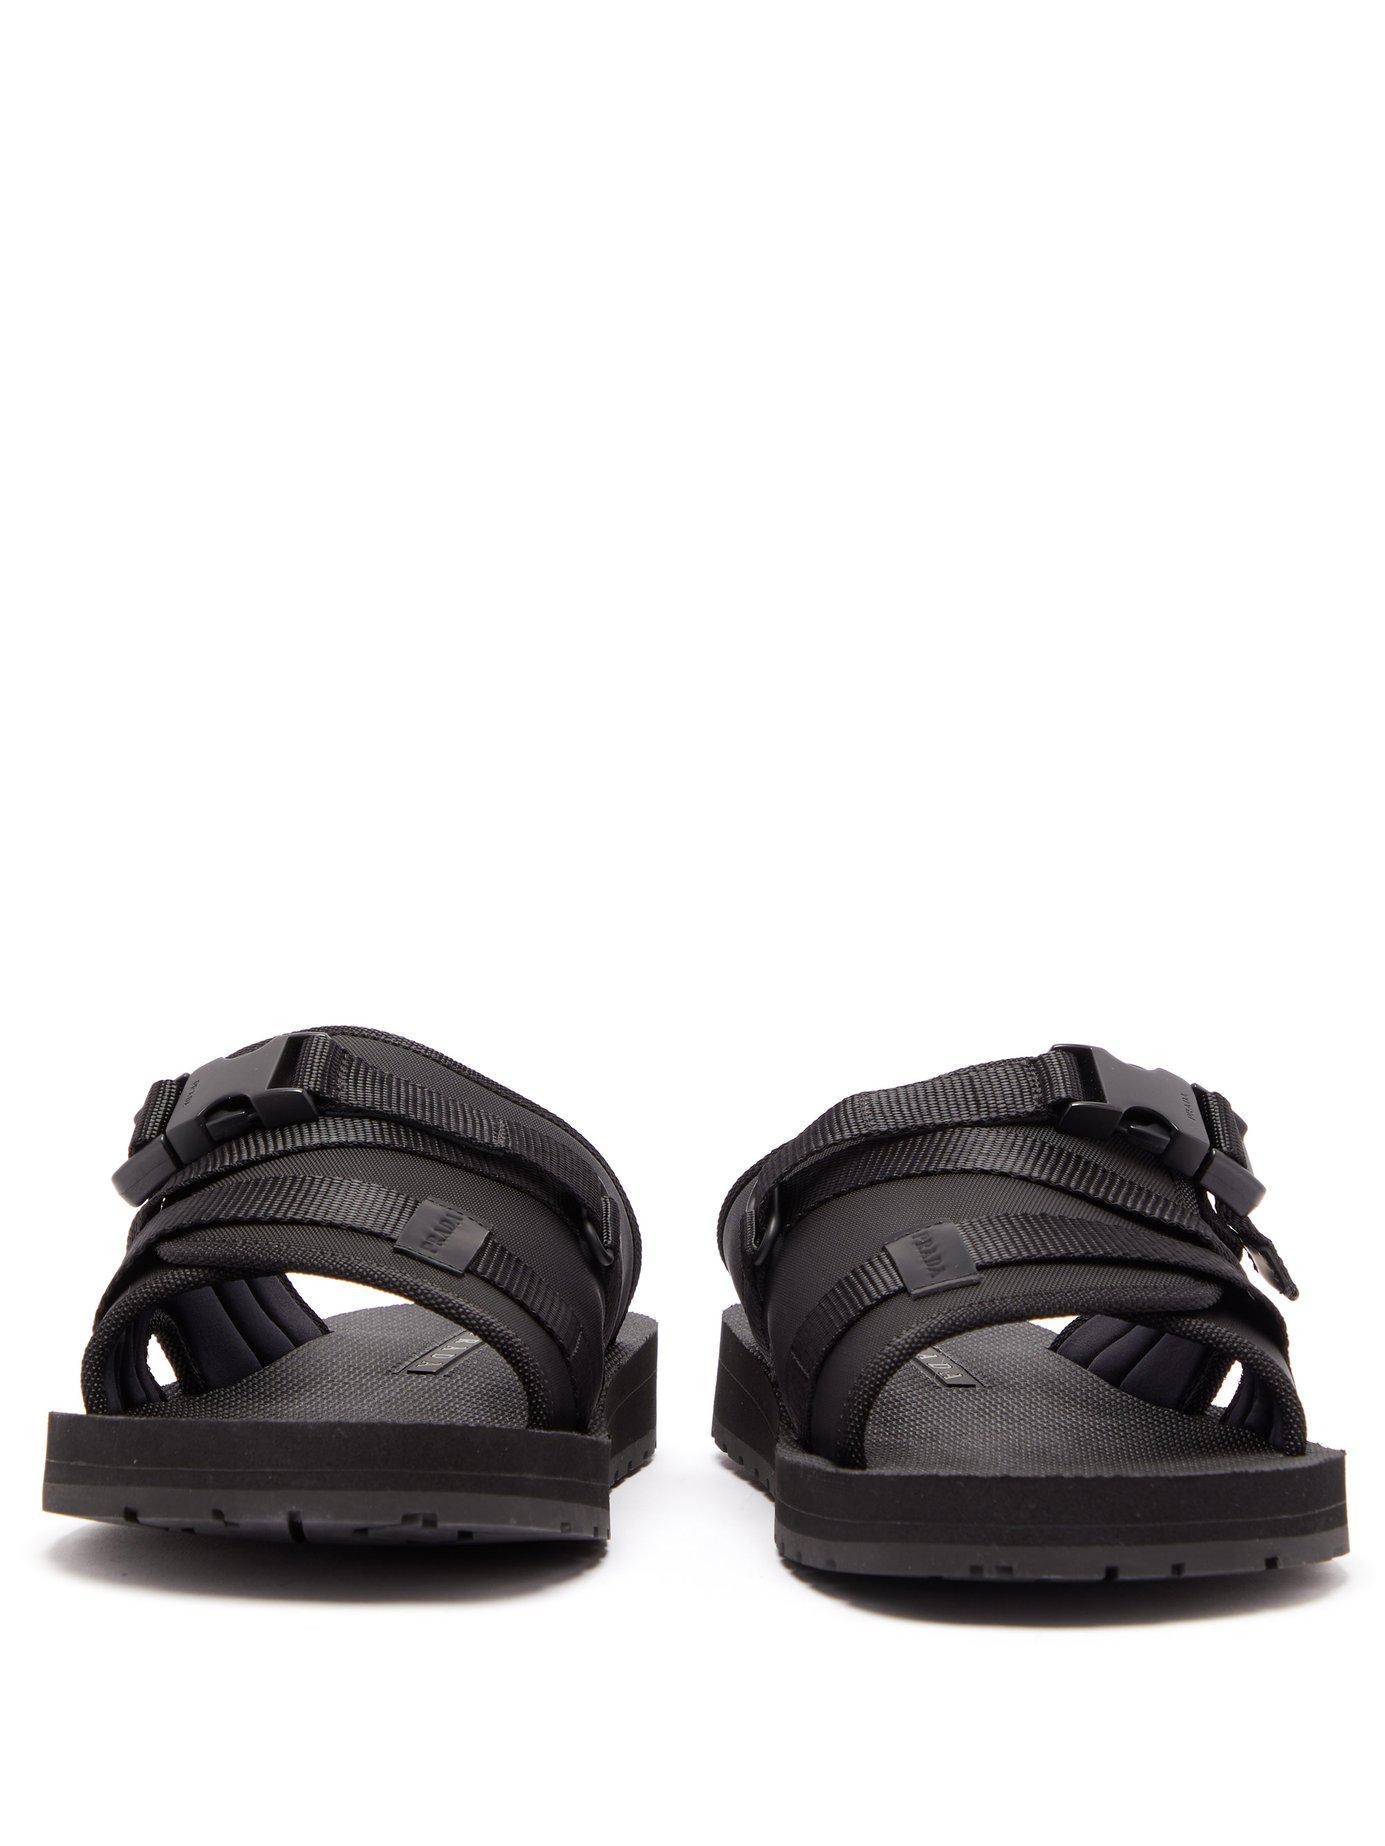 192bcbd5ef7c Prada - Black Buckle Open-toe Sandals for Men - Lyst. View fullscreen